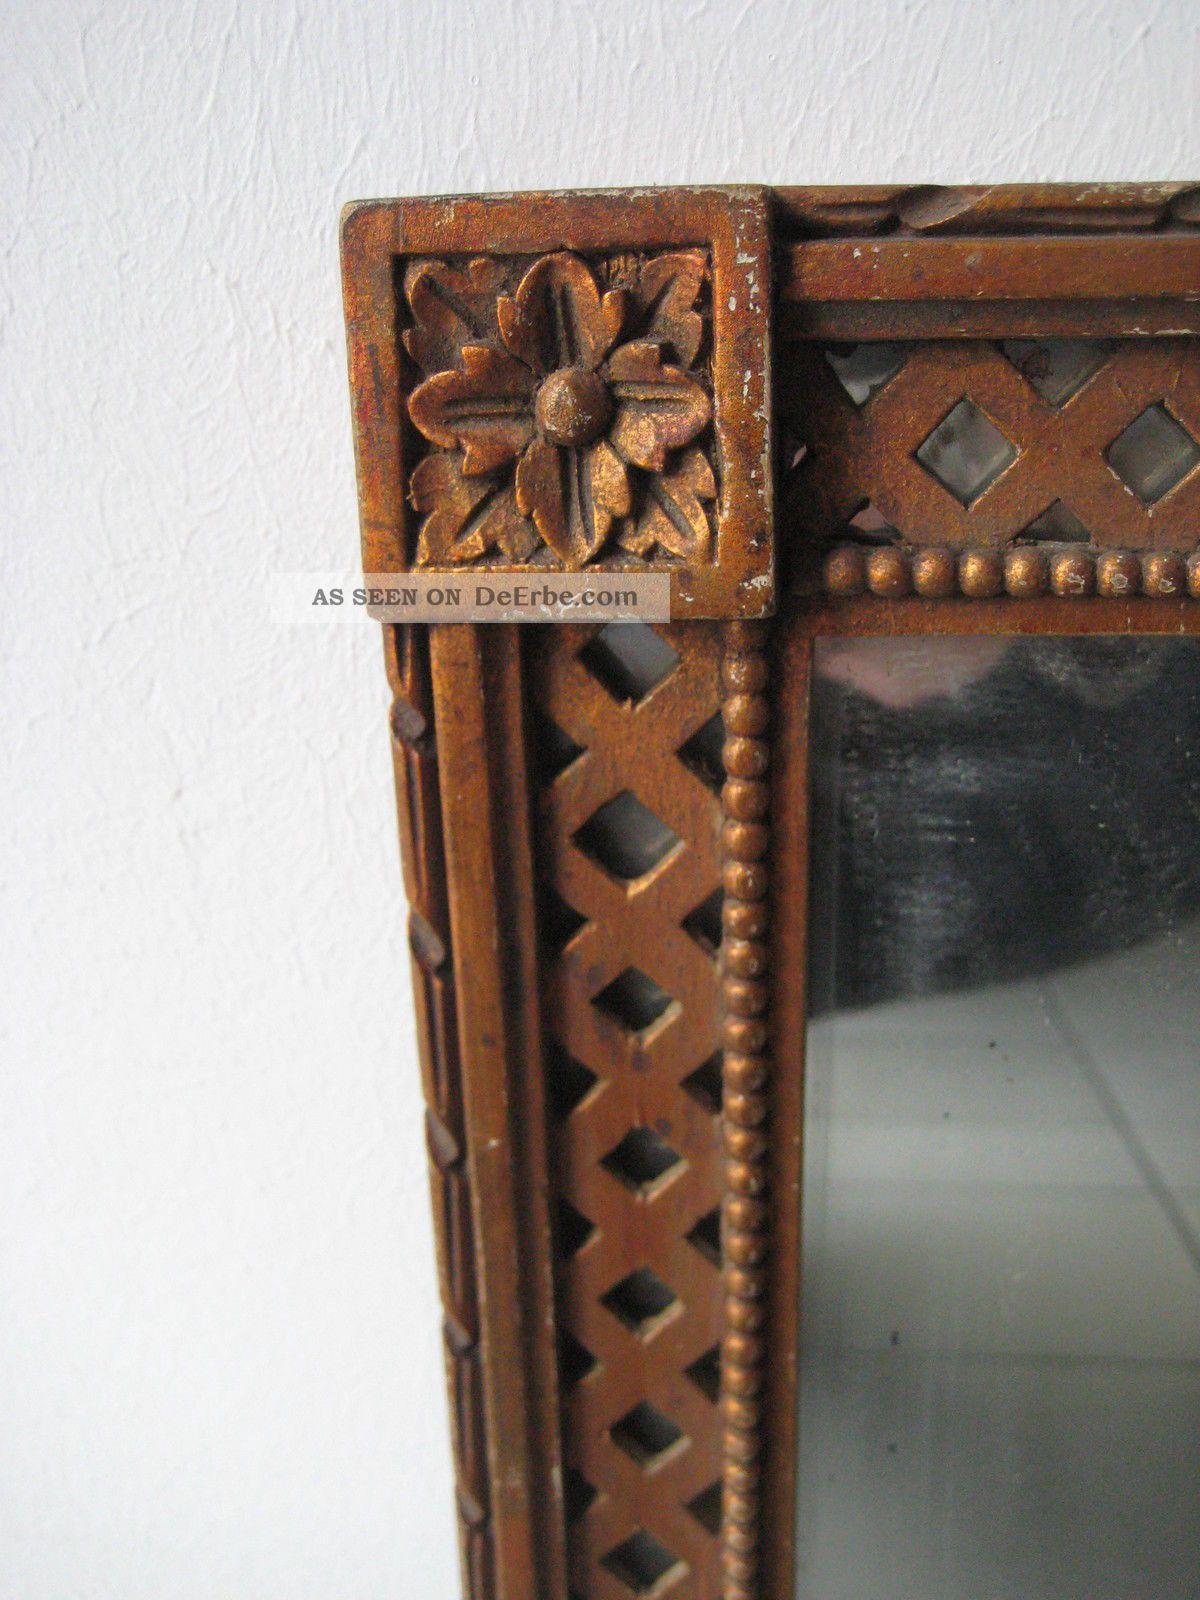 klassizismus spiegel rahmen um 1760 holz geschnitzt goethe schiller weimar. Black Bedroom Furniture Sets. Home Design Ideas